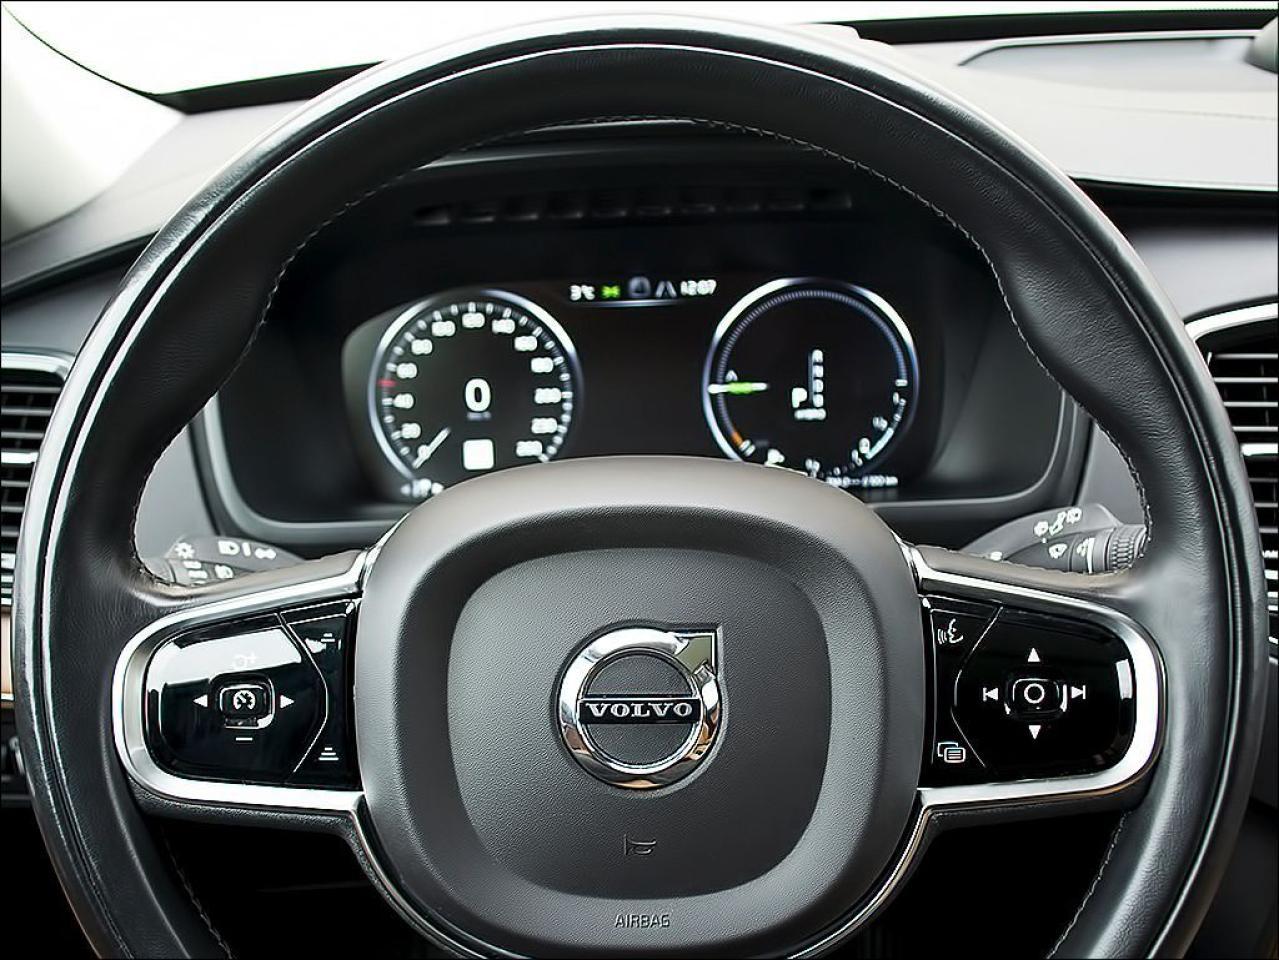 2016 Volvo XC90 HYBRID|T8|INSCRIPTION|BOWERS & WILKINS STEREO|7 SE